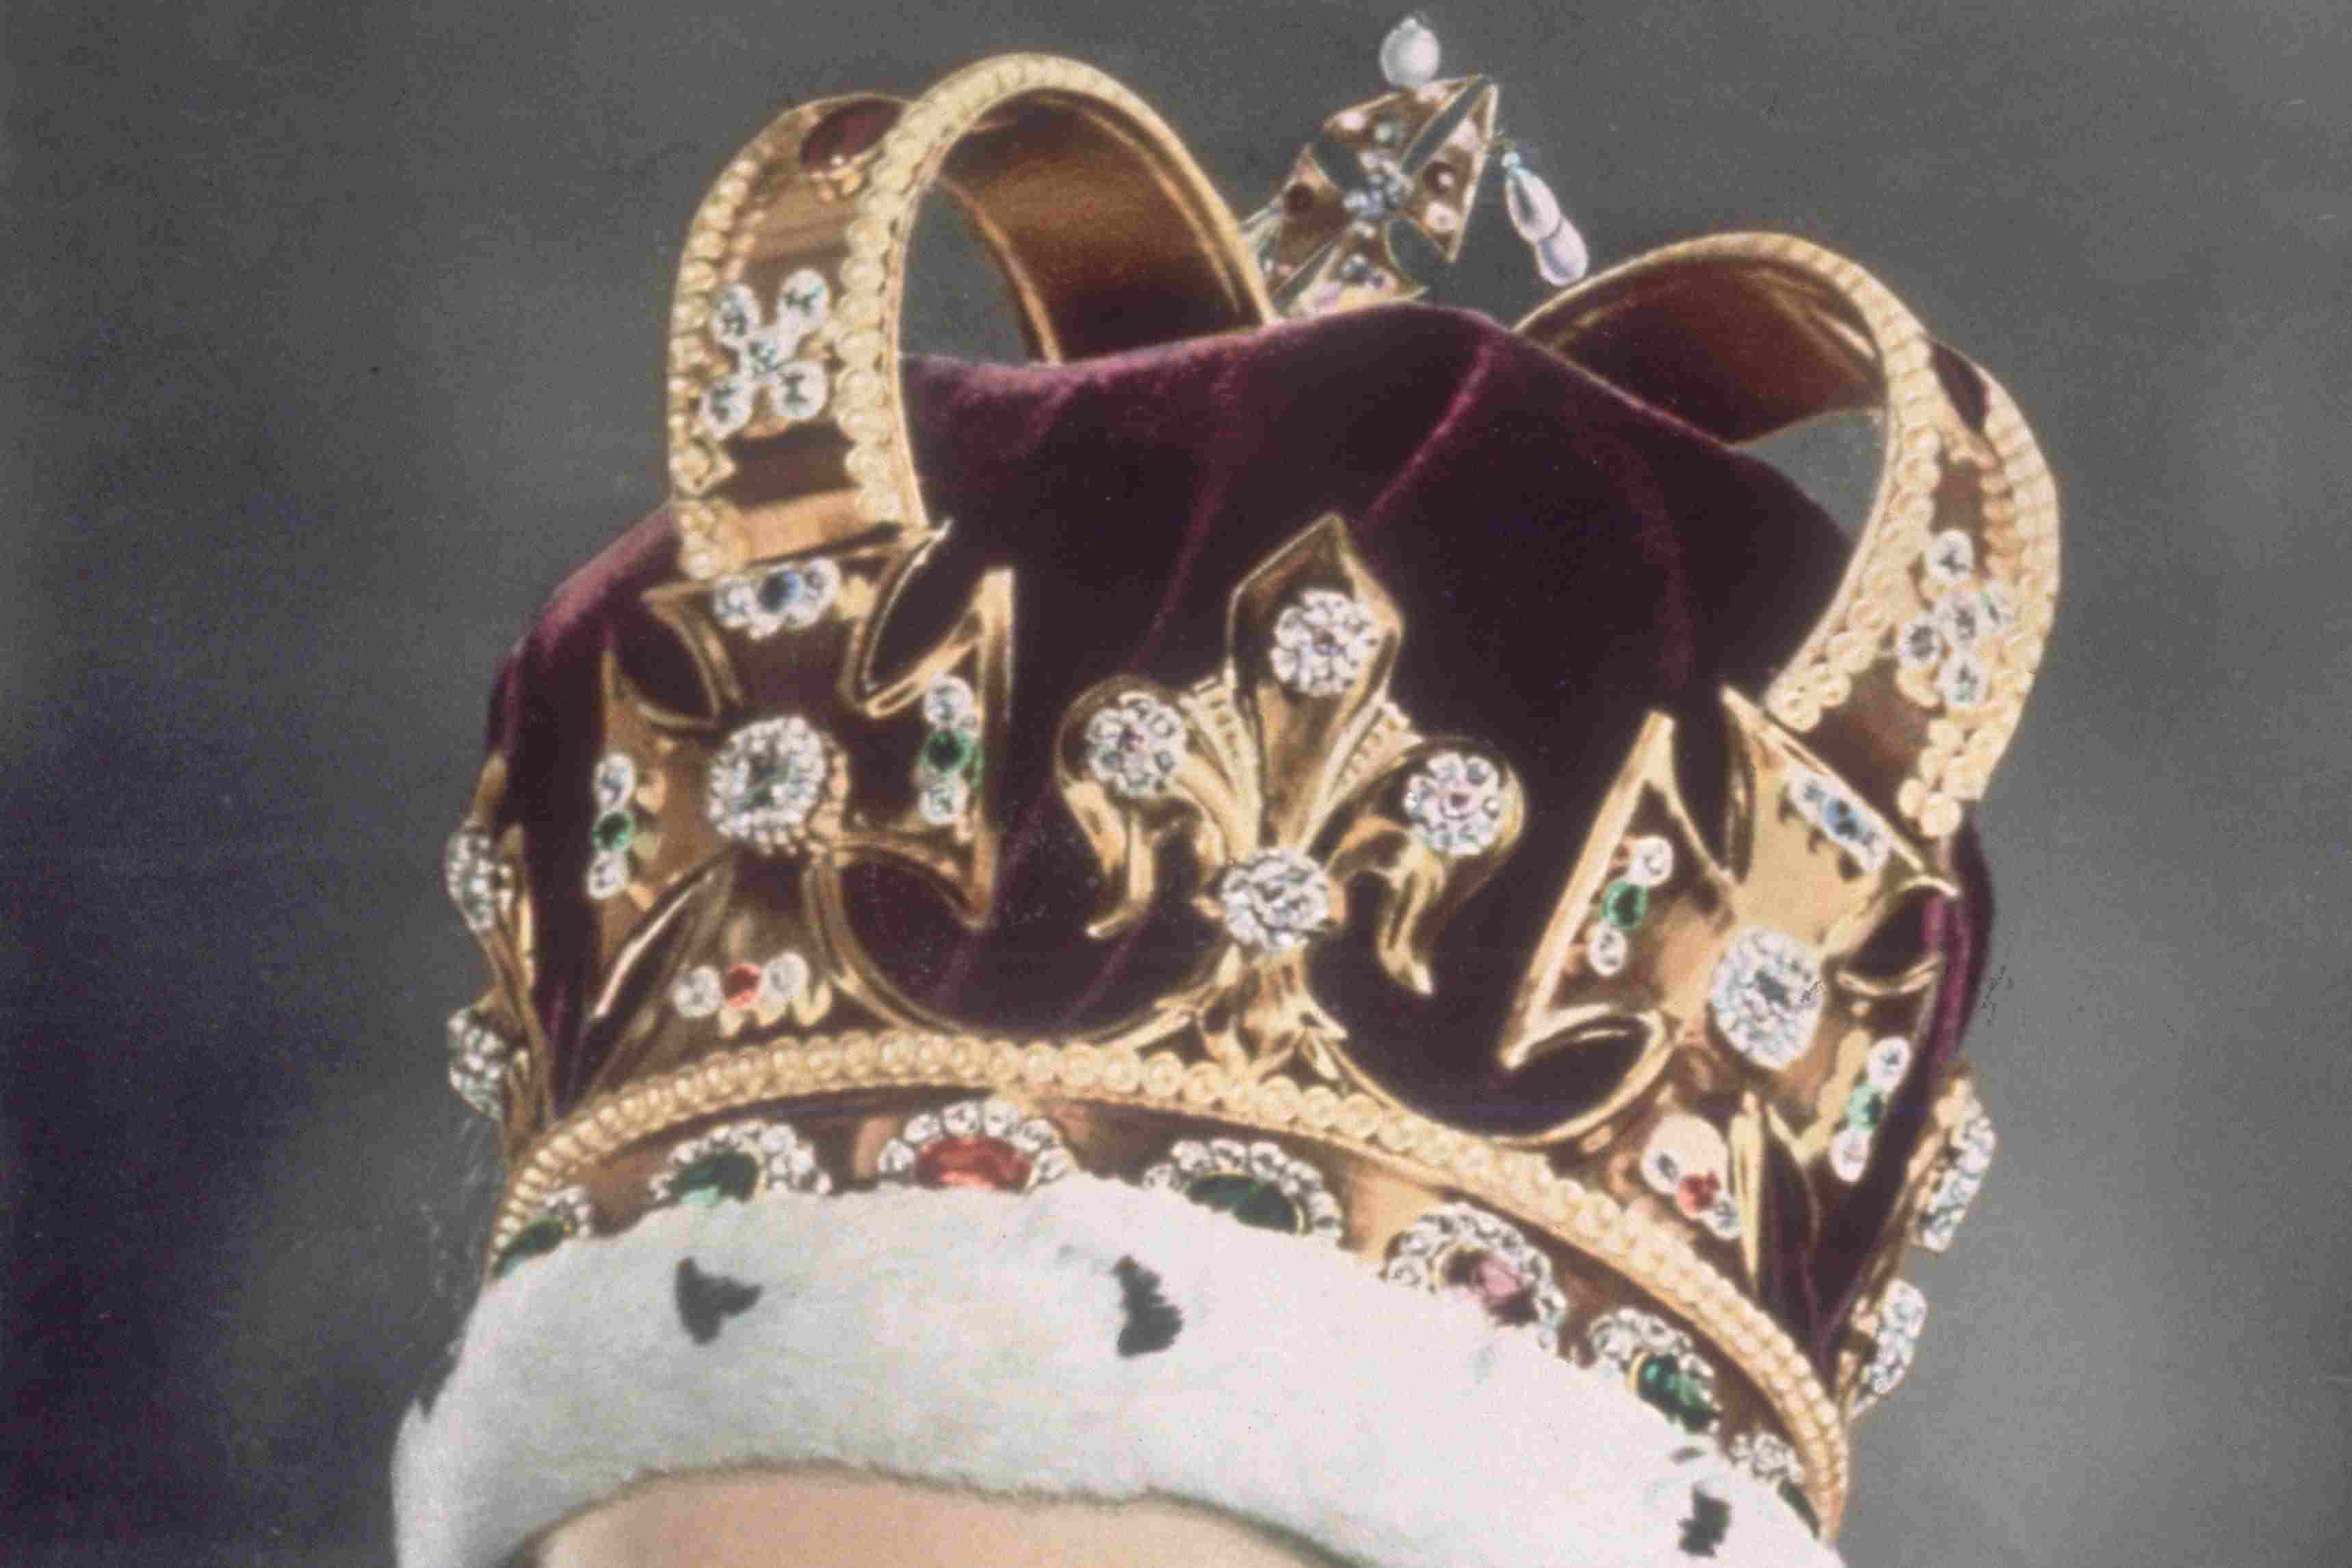 Queen Elizabeth's Coronation Crown